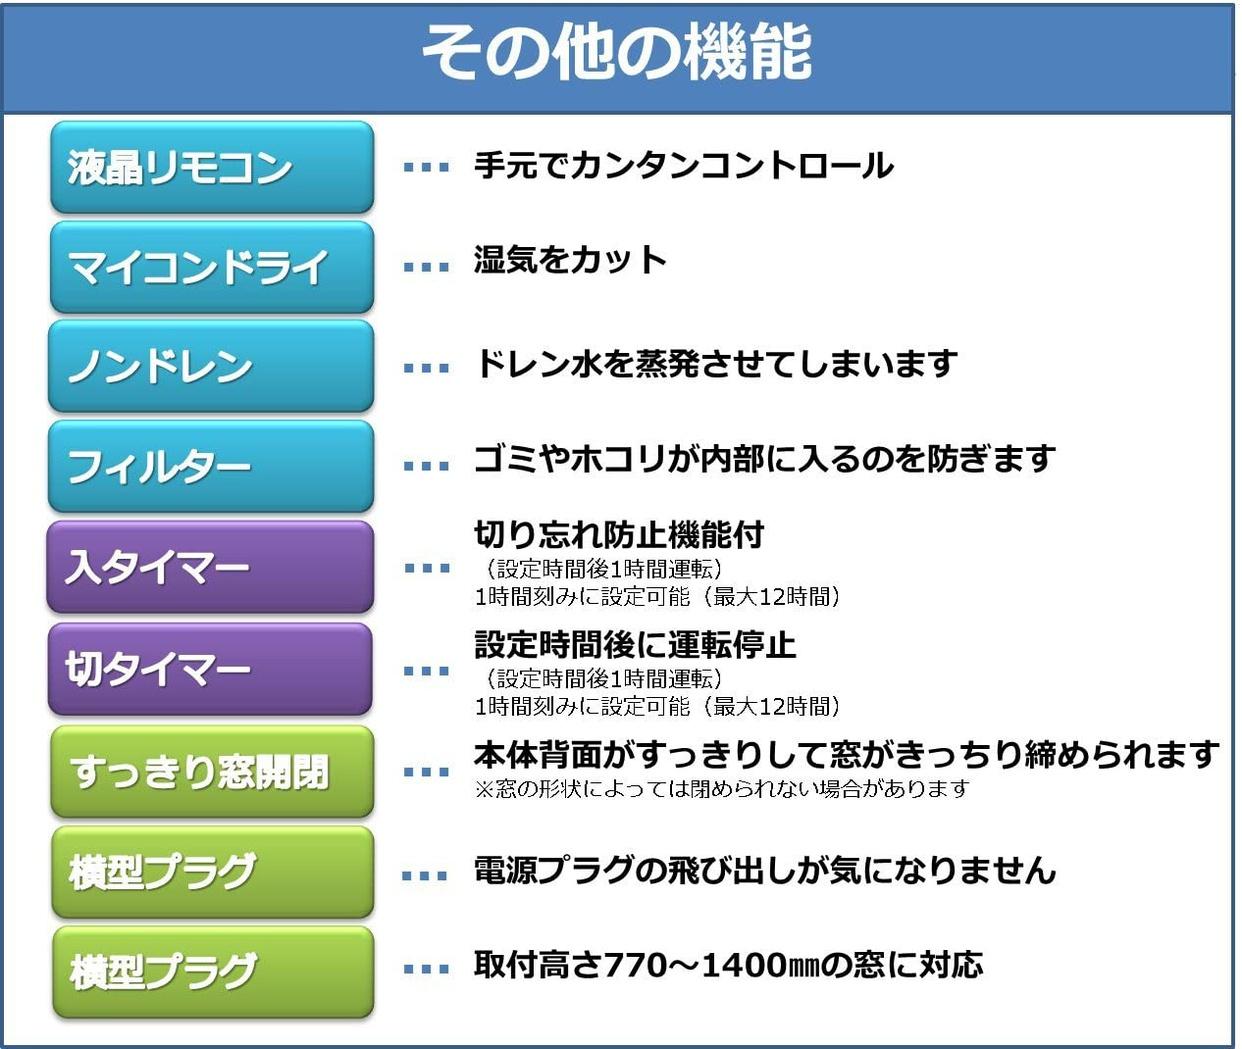 KOIZUMI(コイズミ) ルームエアコン KAW-1602/Wの商品画像7